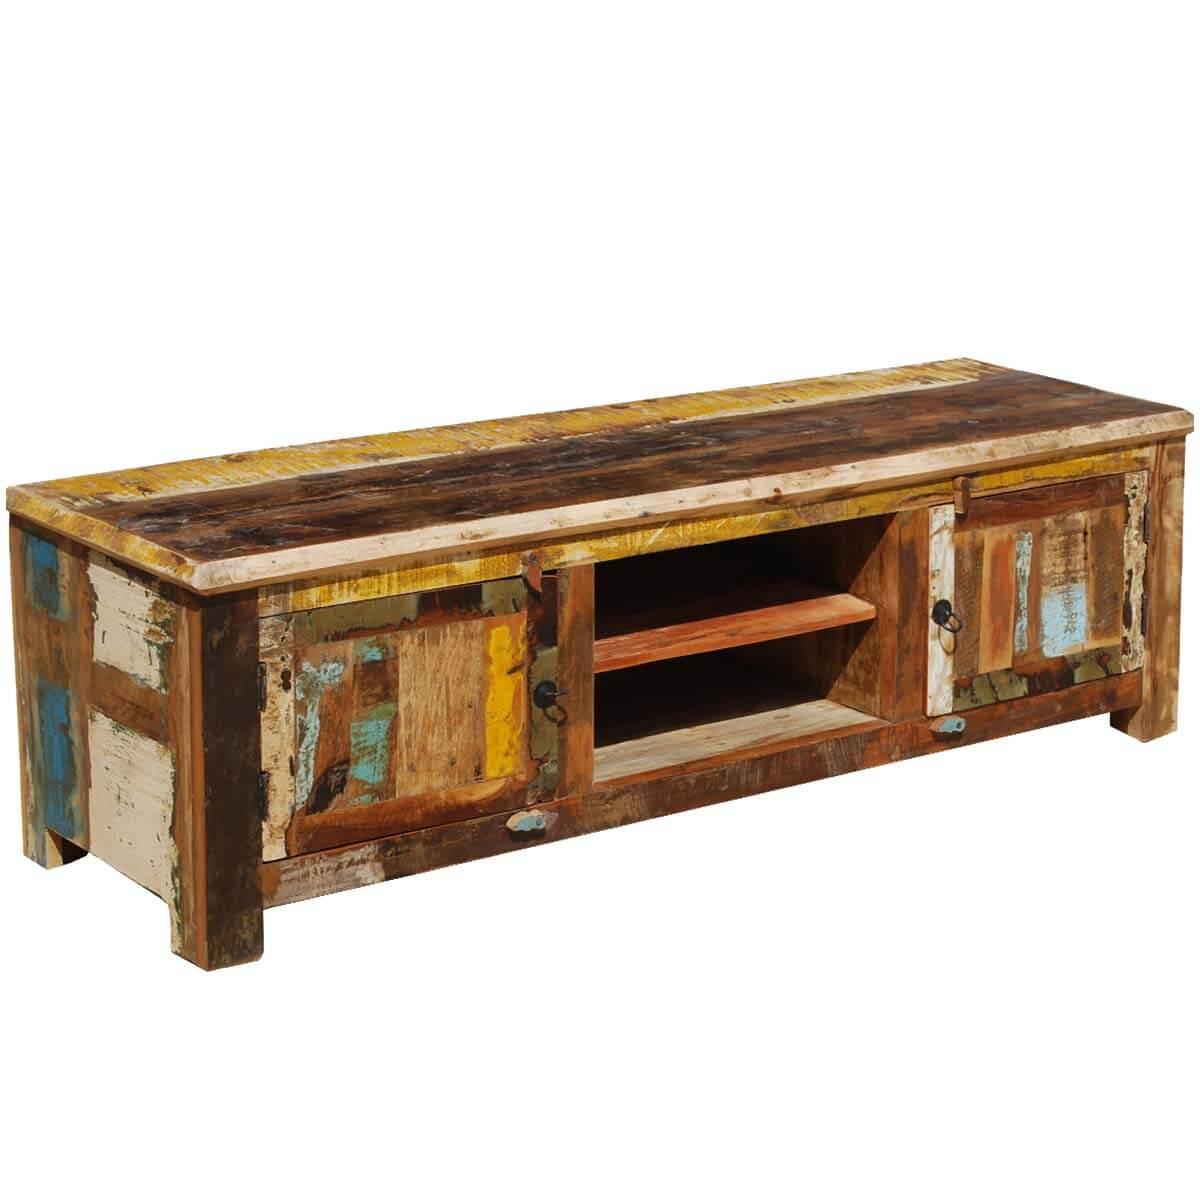 Appalachian rustic old wood double door tv media console